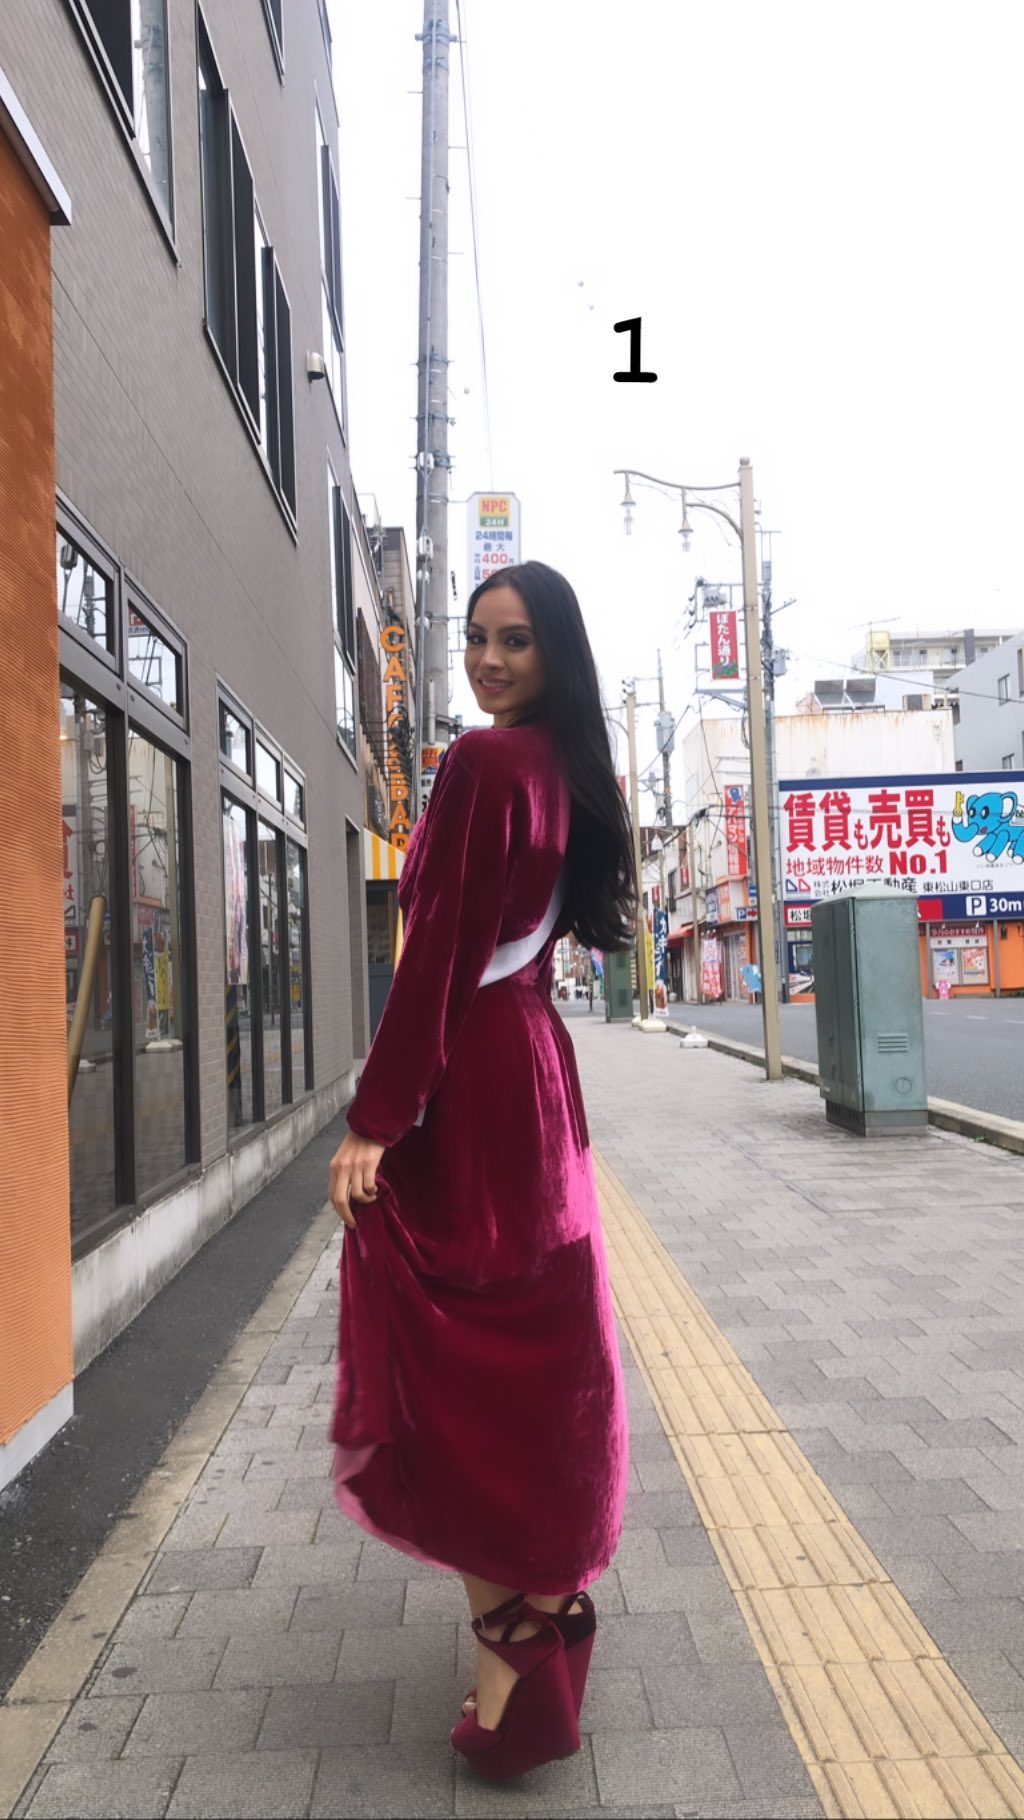 maria alejandra vengoechea, miss colombia hispanoamericana 2021/3rd runner-up de miss international 2019. - Página 6 72296710